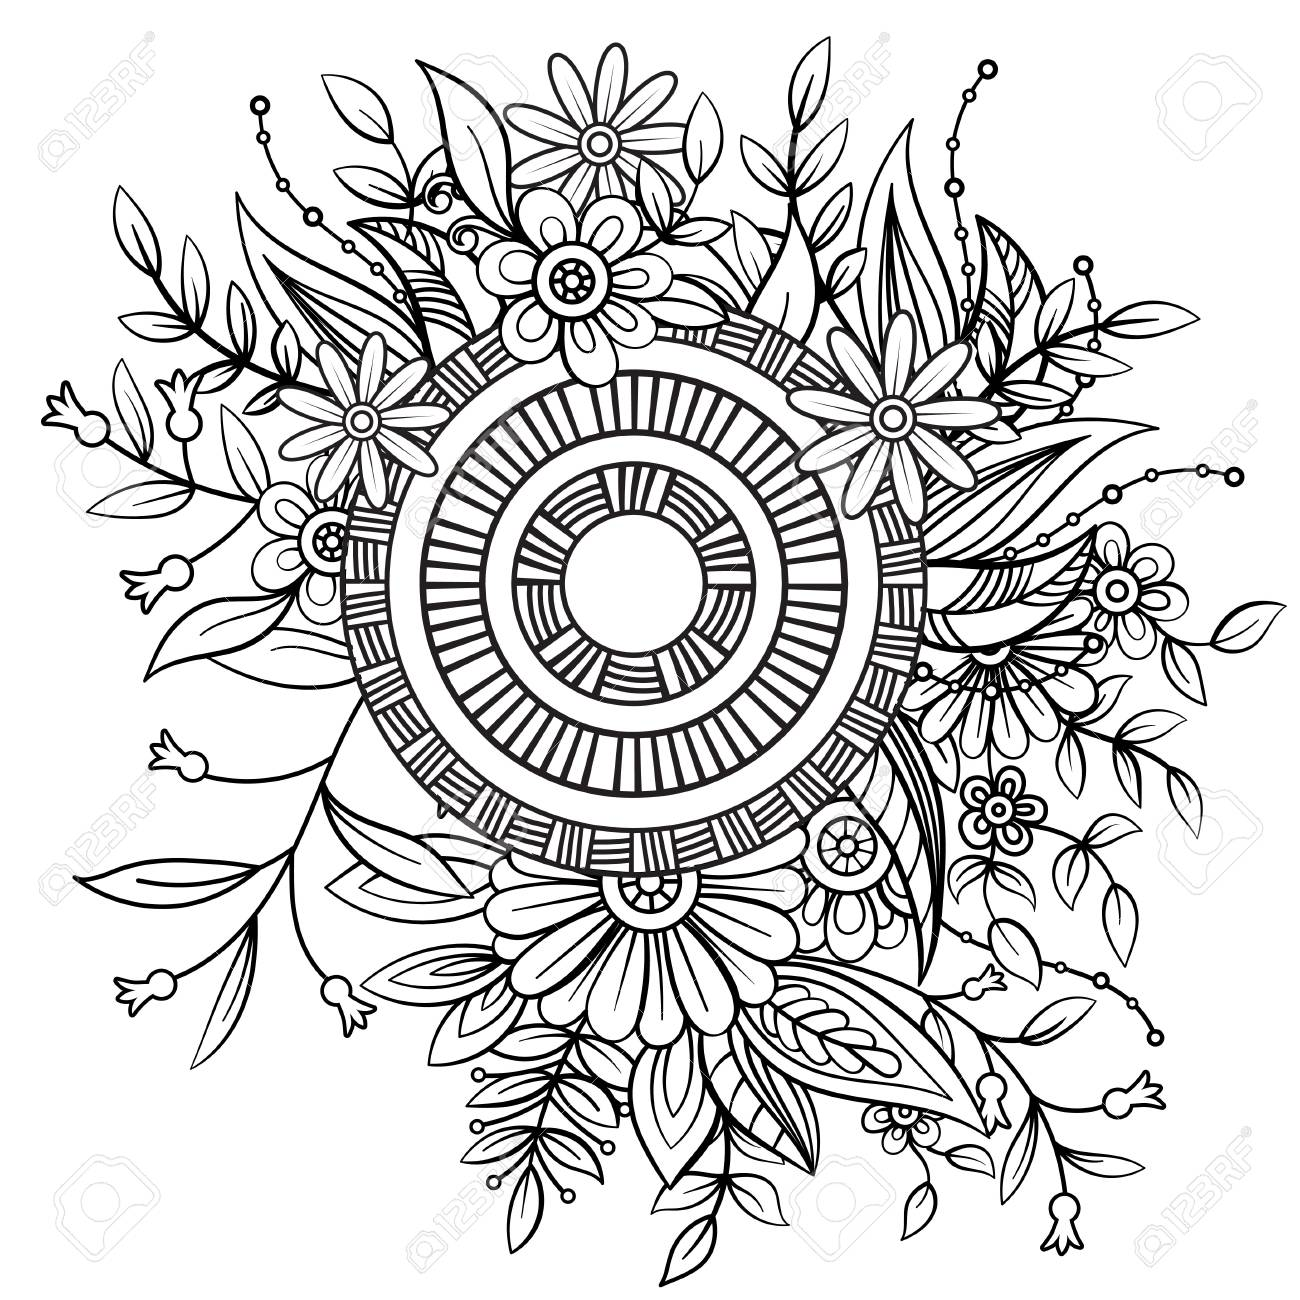 Art therapy | Mandala coloring, Simple mandala, Mandala coloring pages | 1300x1300